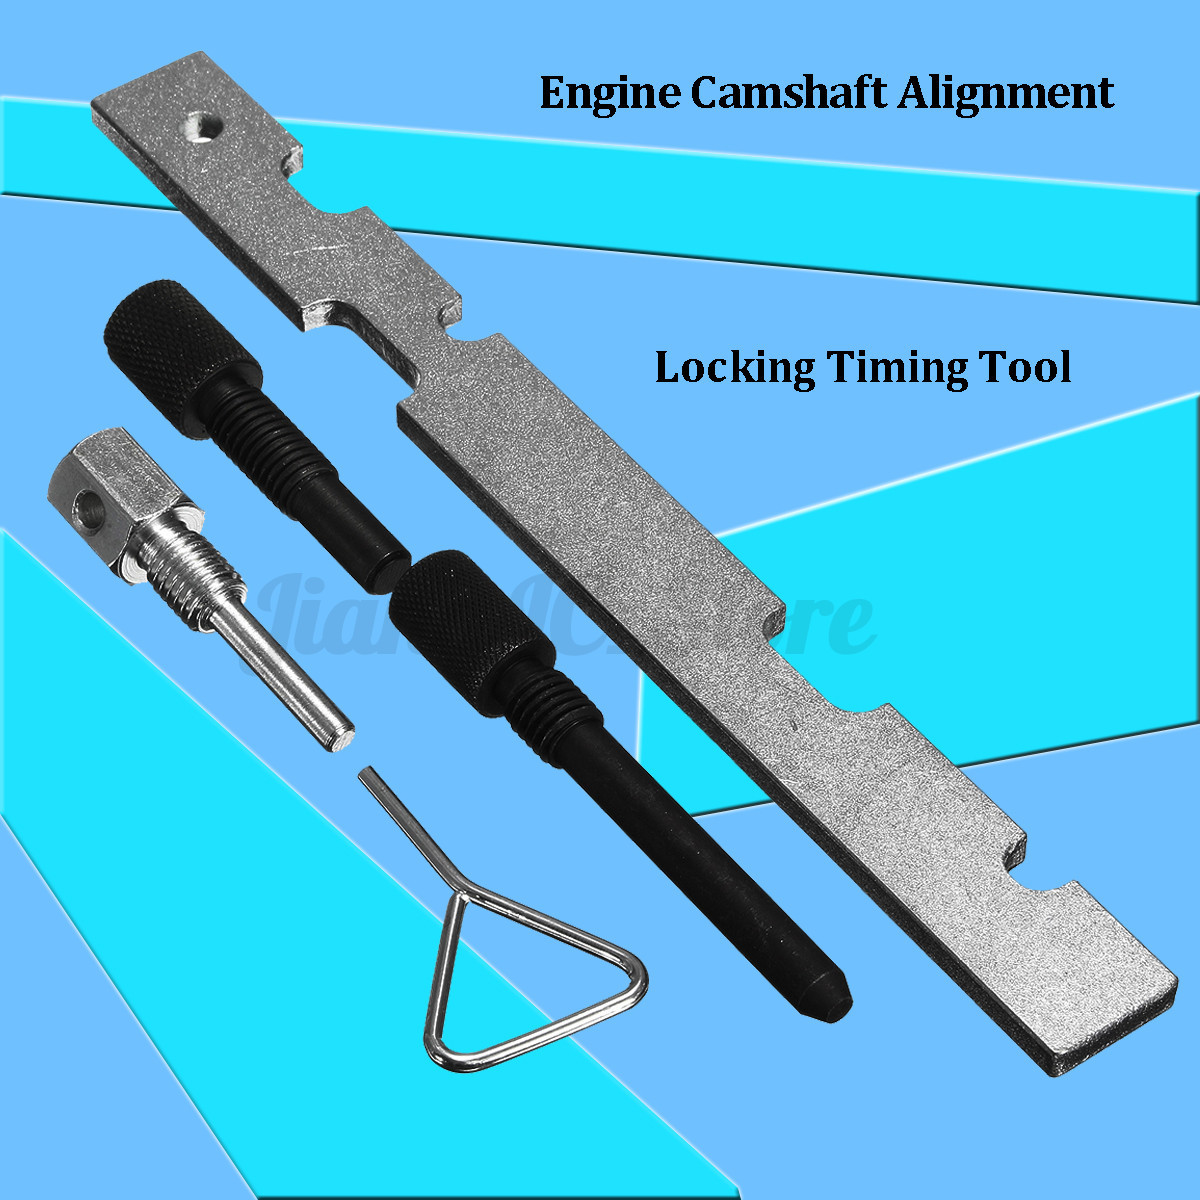 5Pc Engine Camshaft Cam Lock Locking Timing Alignment Tool